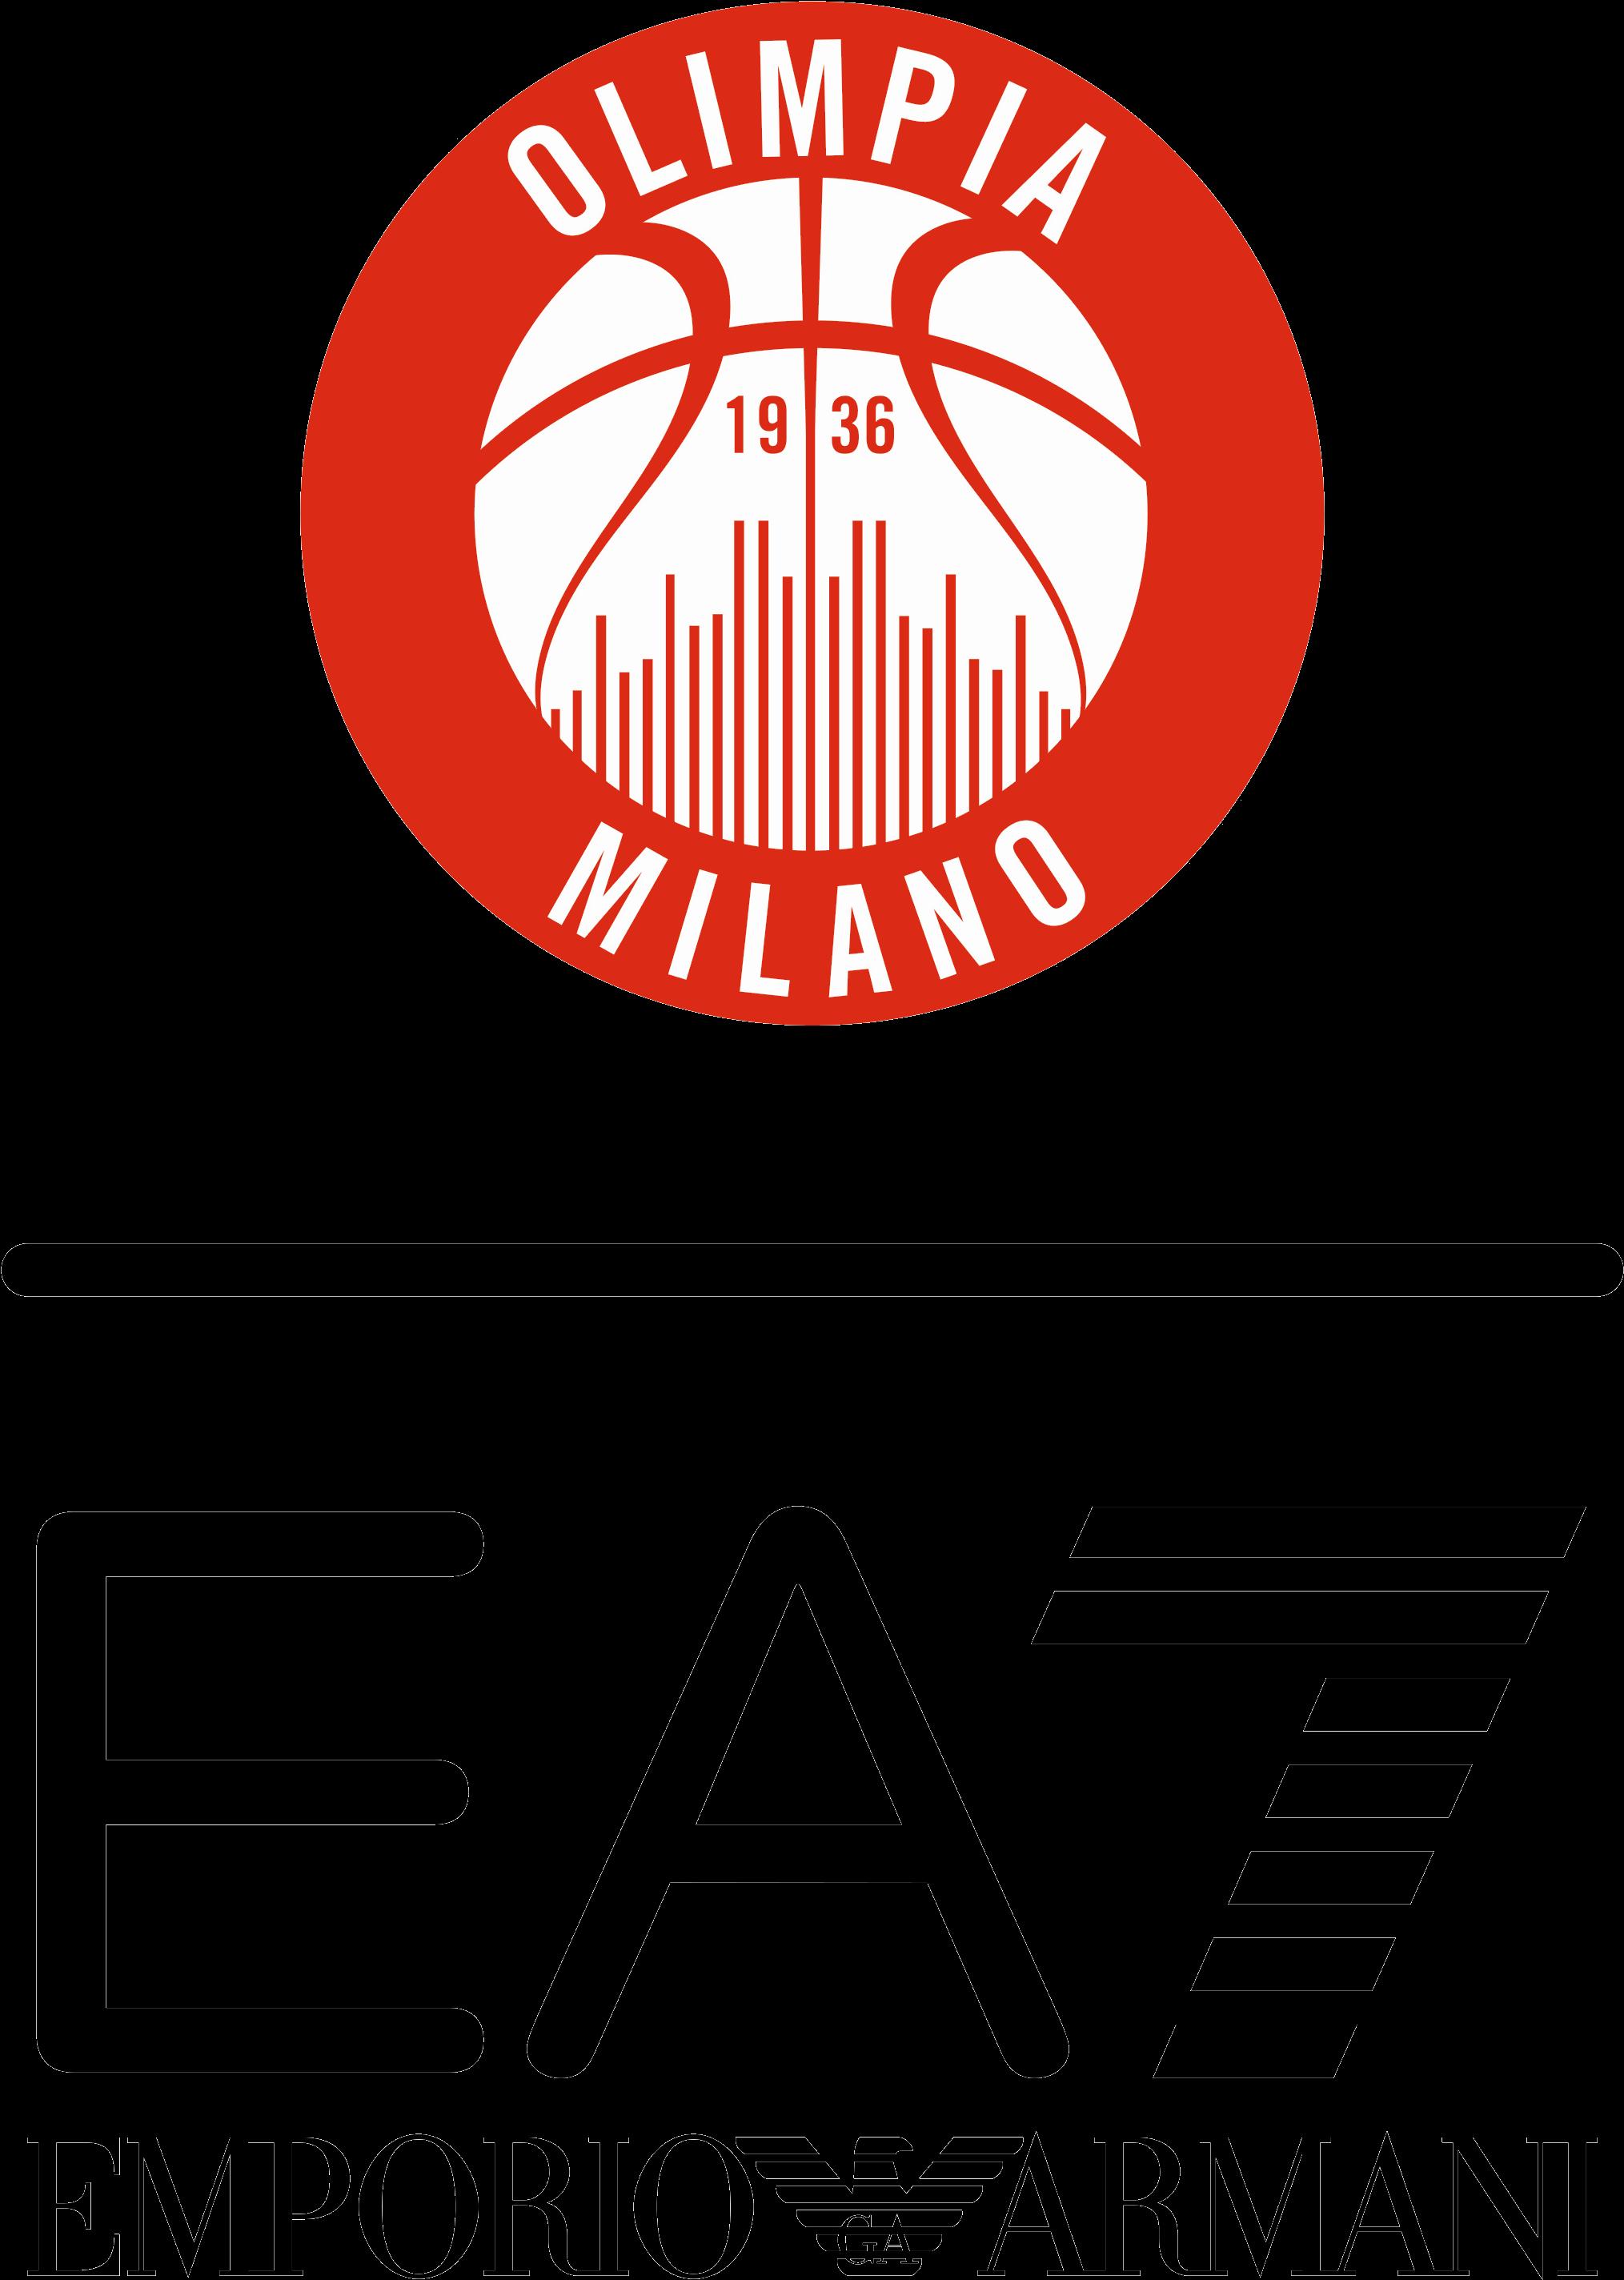 Emporio armani logo clipart banner freeuse HD Ea7 Emporio Armani Milano - Olimpia Milano , Free Unlimited ... banner freeuse